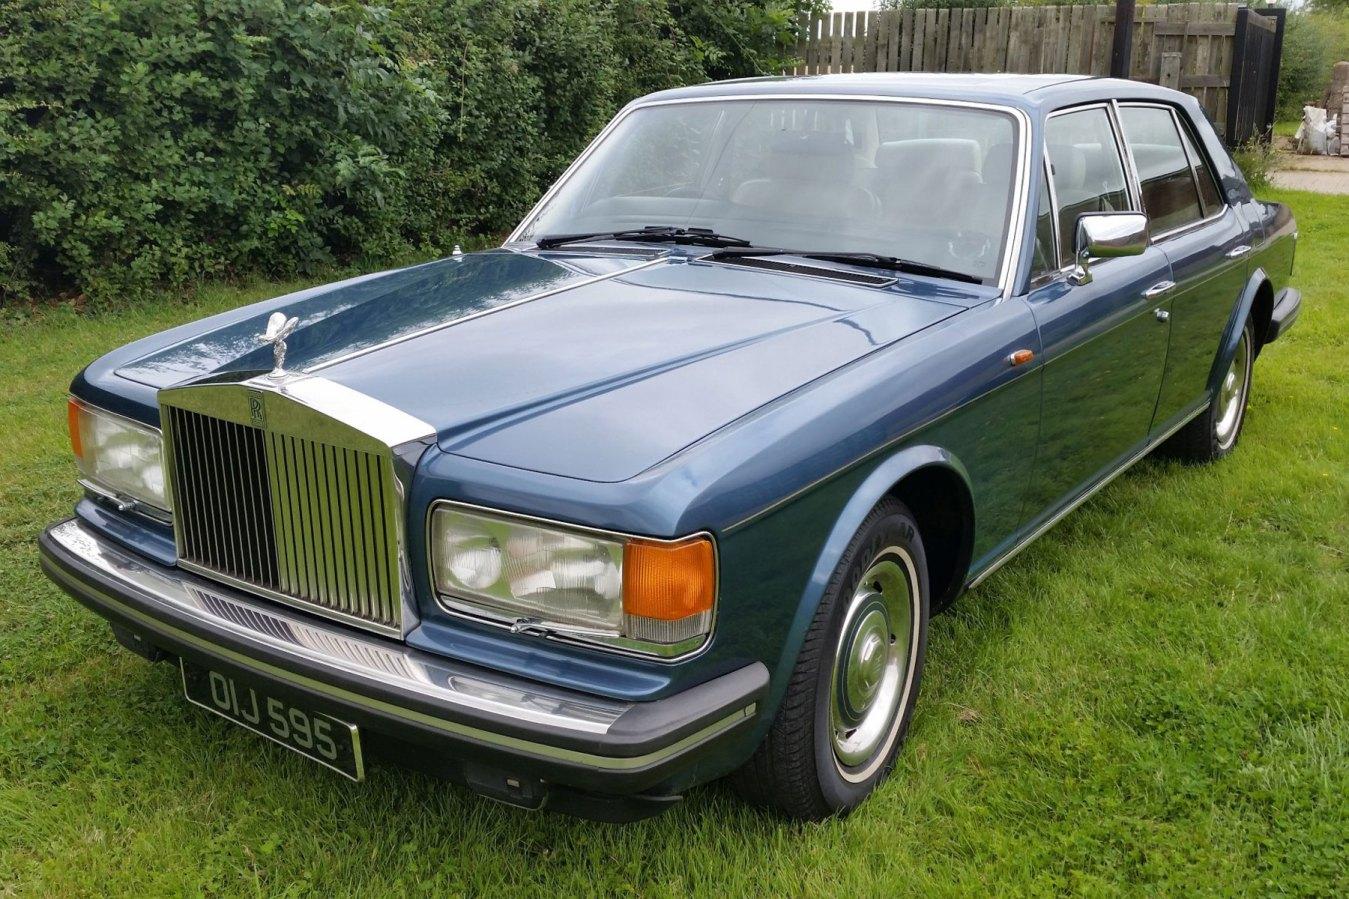 Alan Sugar's Rolls-Royce